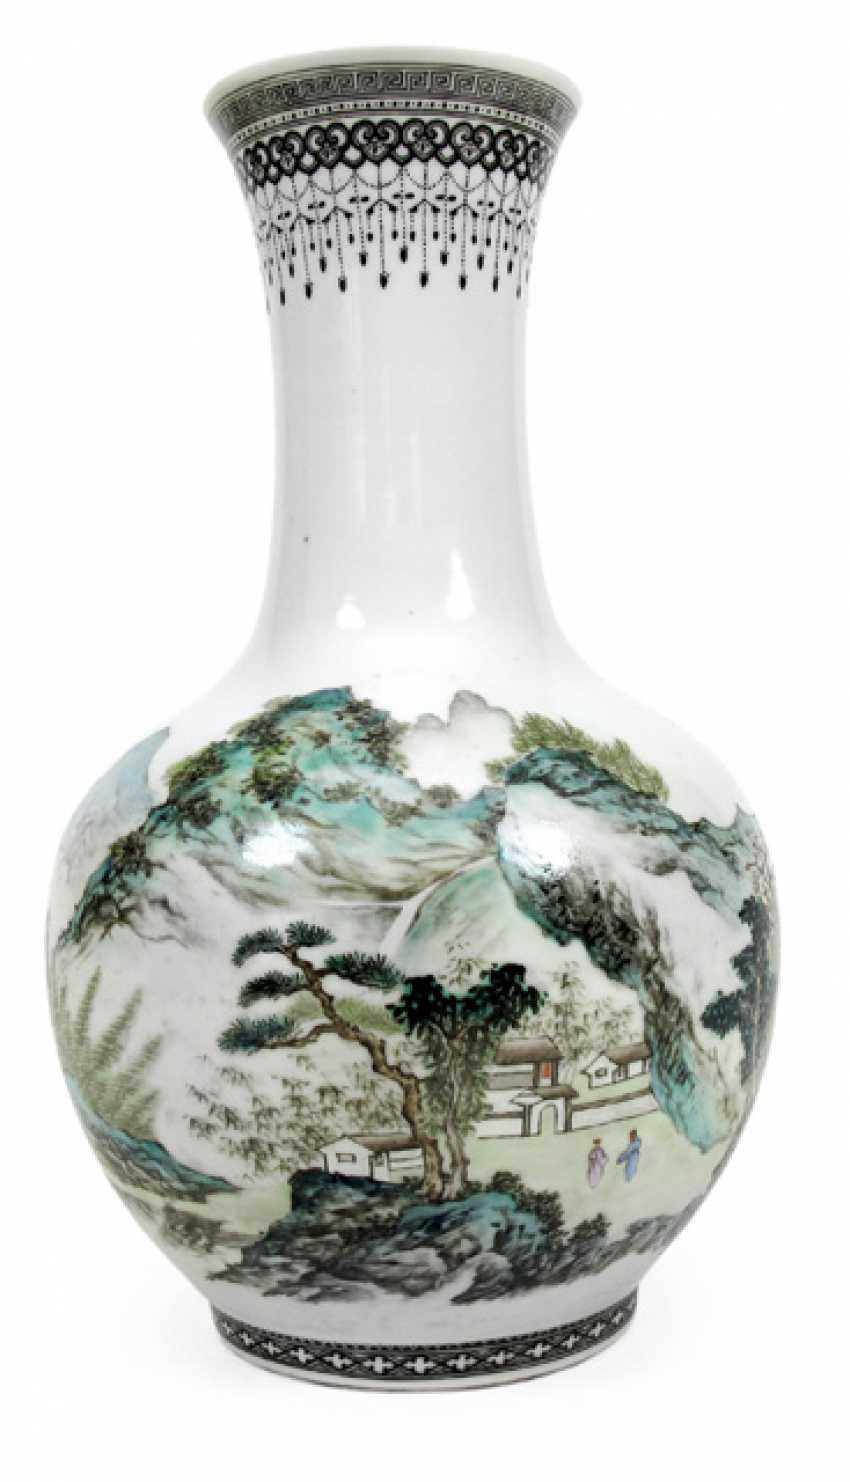 Polychrome decorated Vase, made of porcelain with landscape decor - photo 1